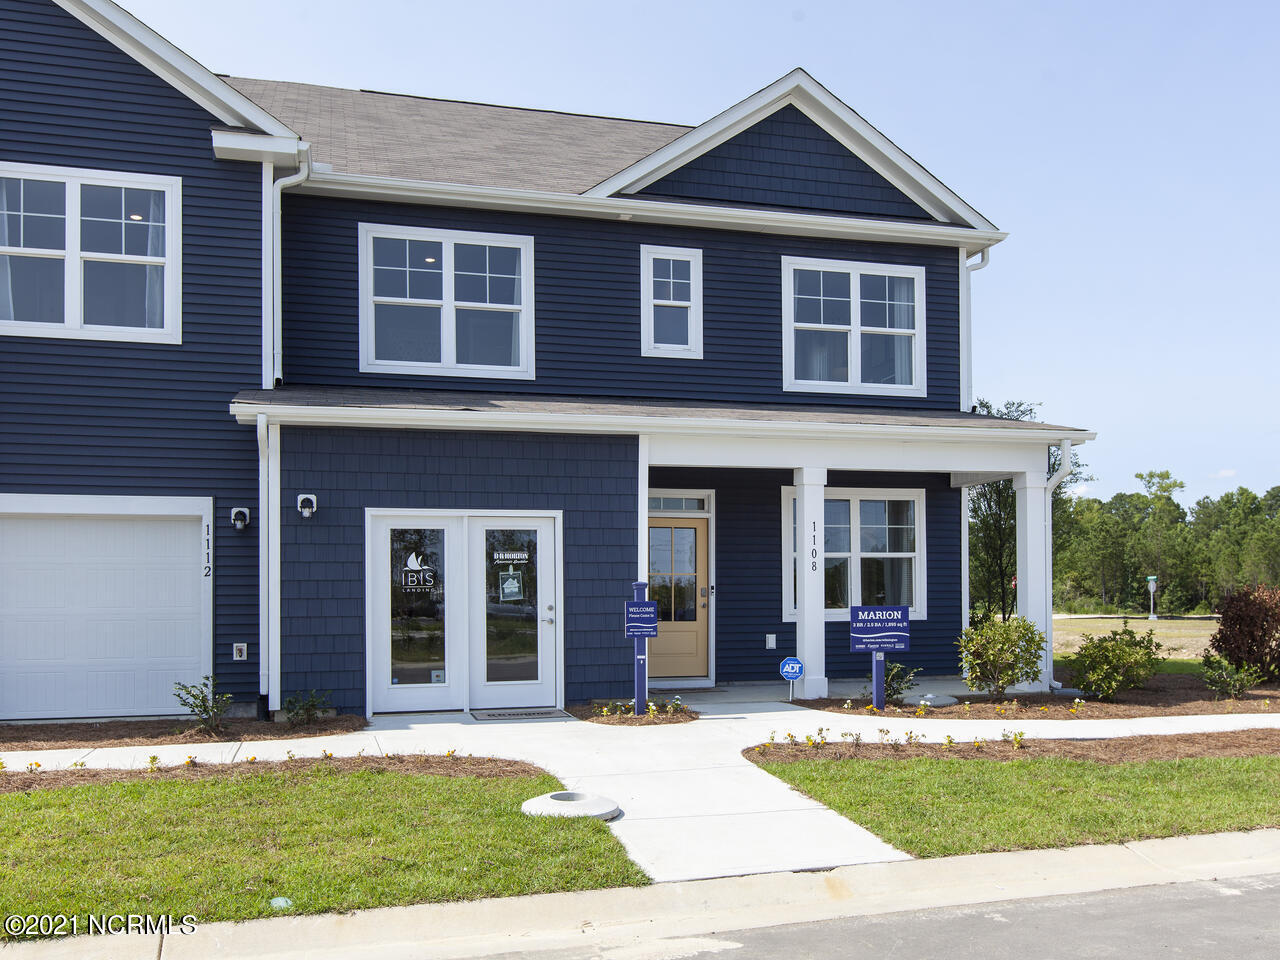 7554 Knightbell Circle UNIT Lot 59 Leland, NC 28451